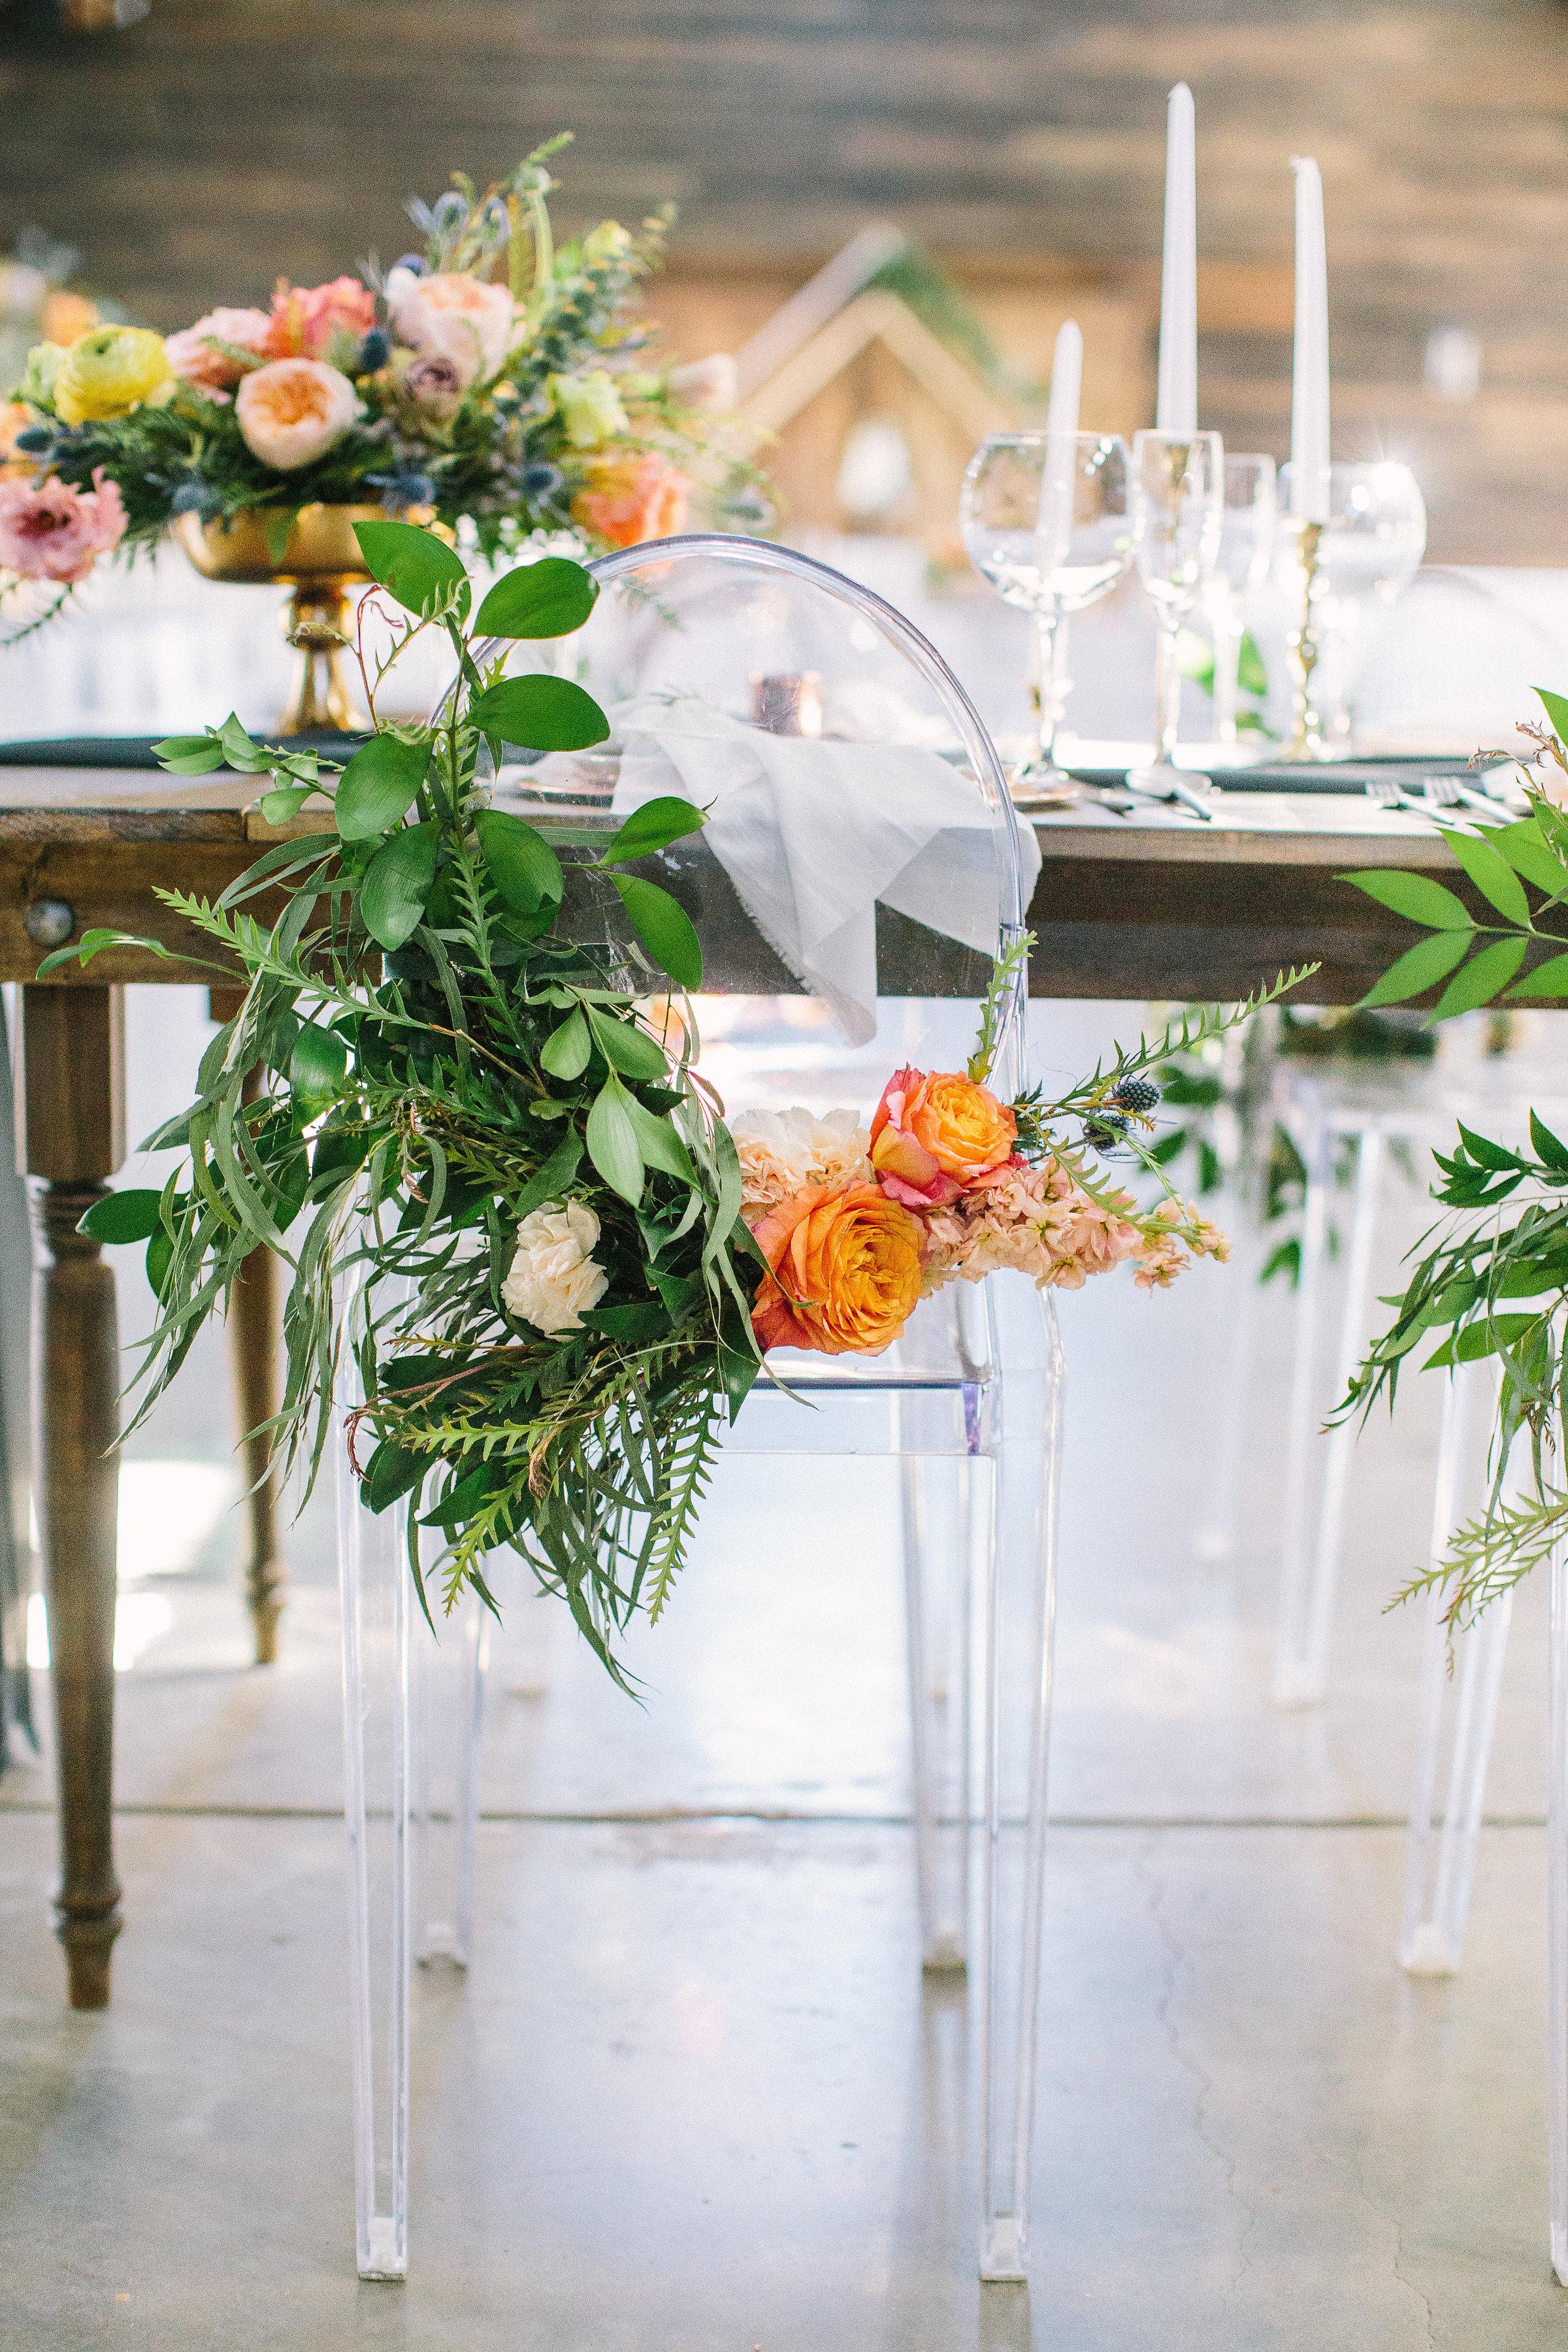 Ellen-Ashton-Photography-Peach-Creek-Ranch-Weddings-Wed-and-Prosper88